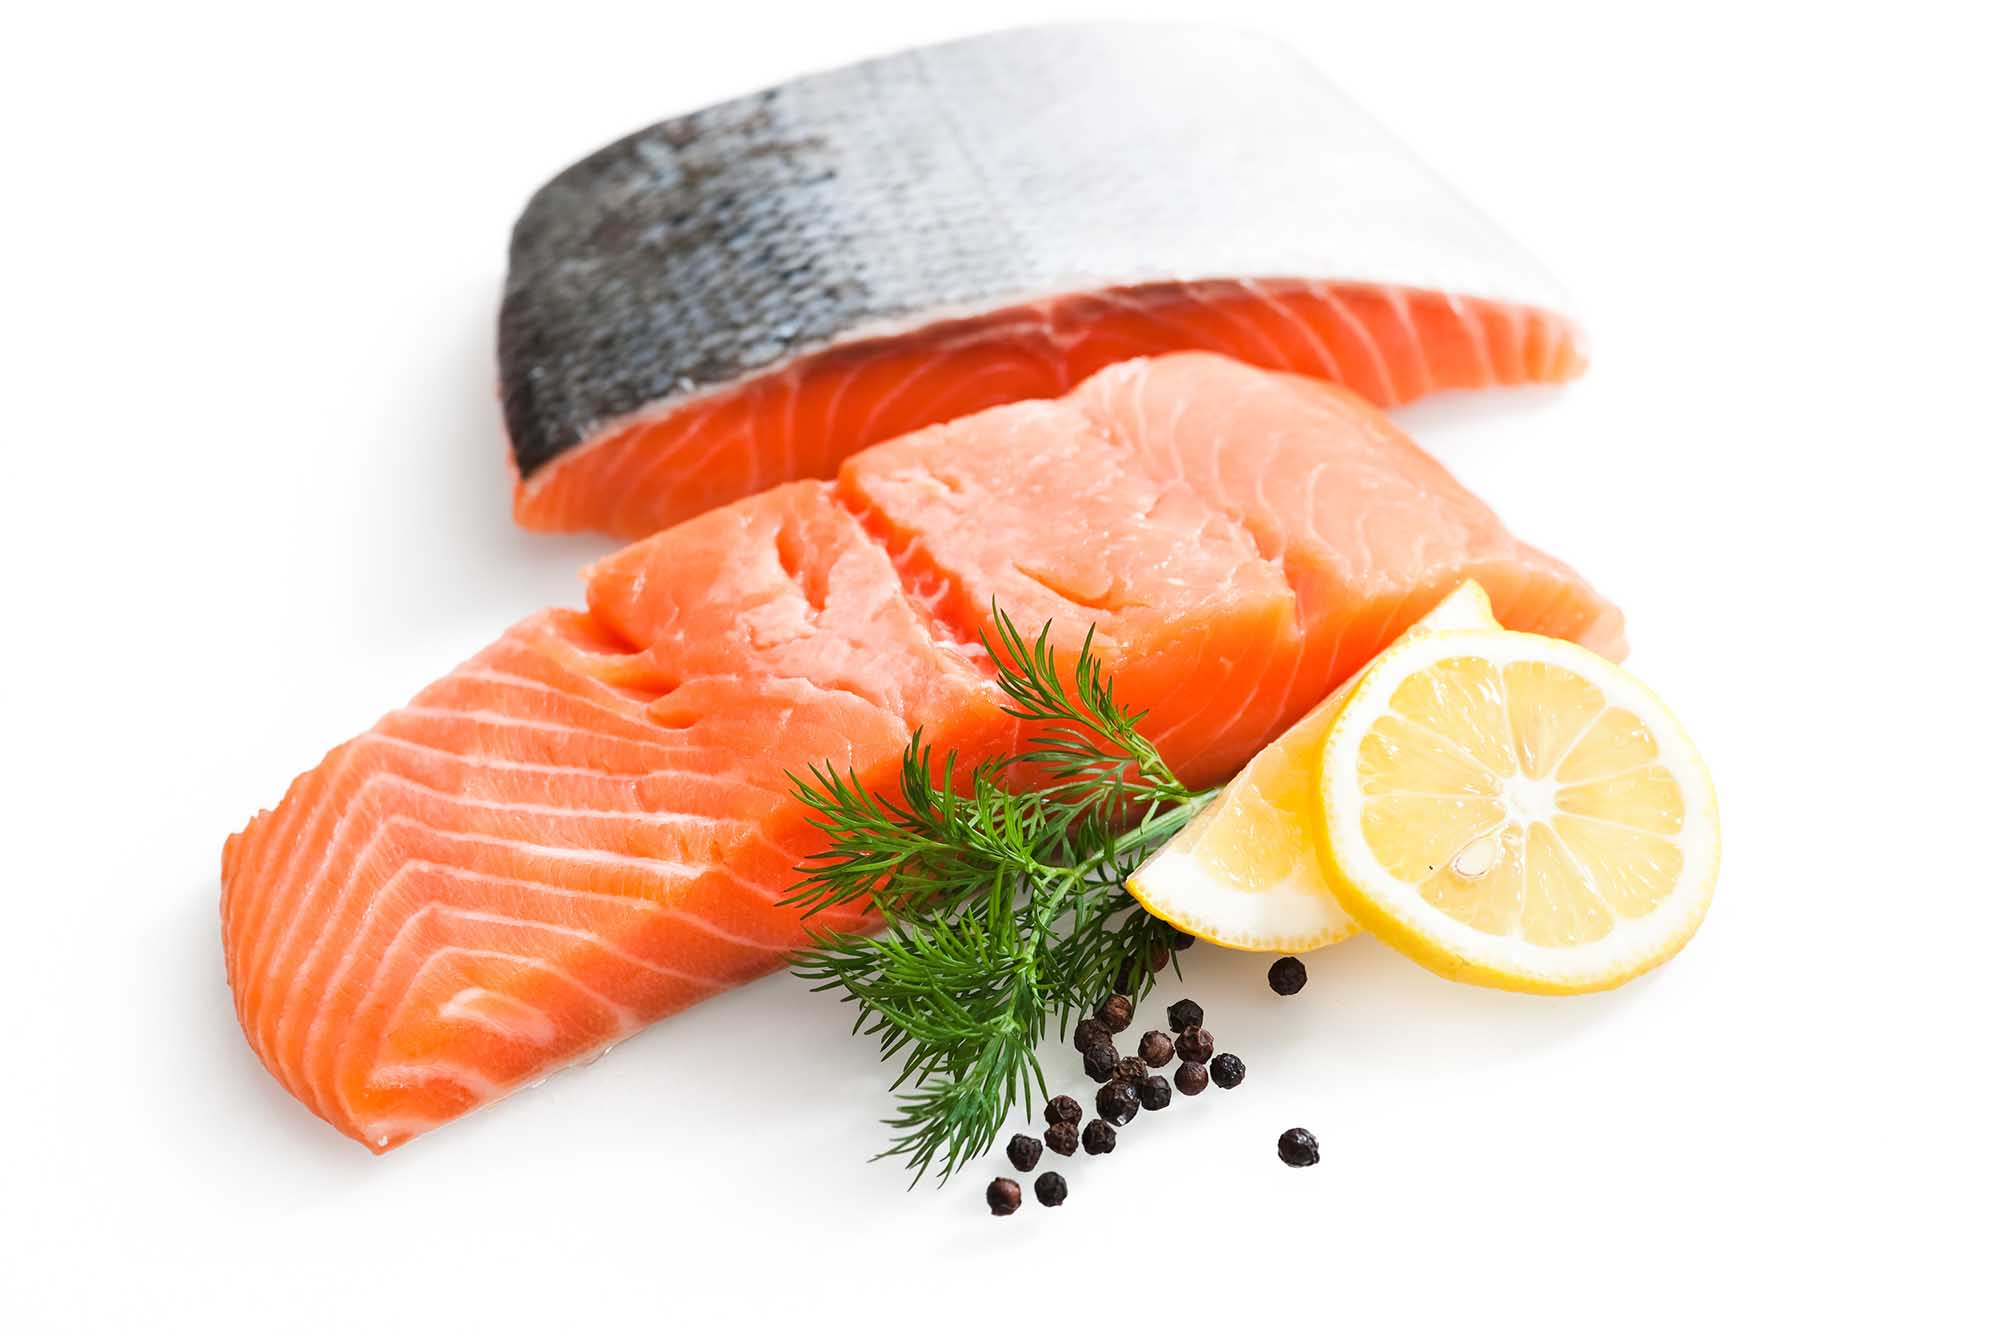 Salmon with lemon and garnish